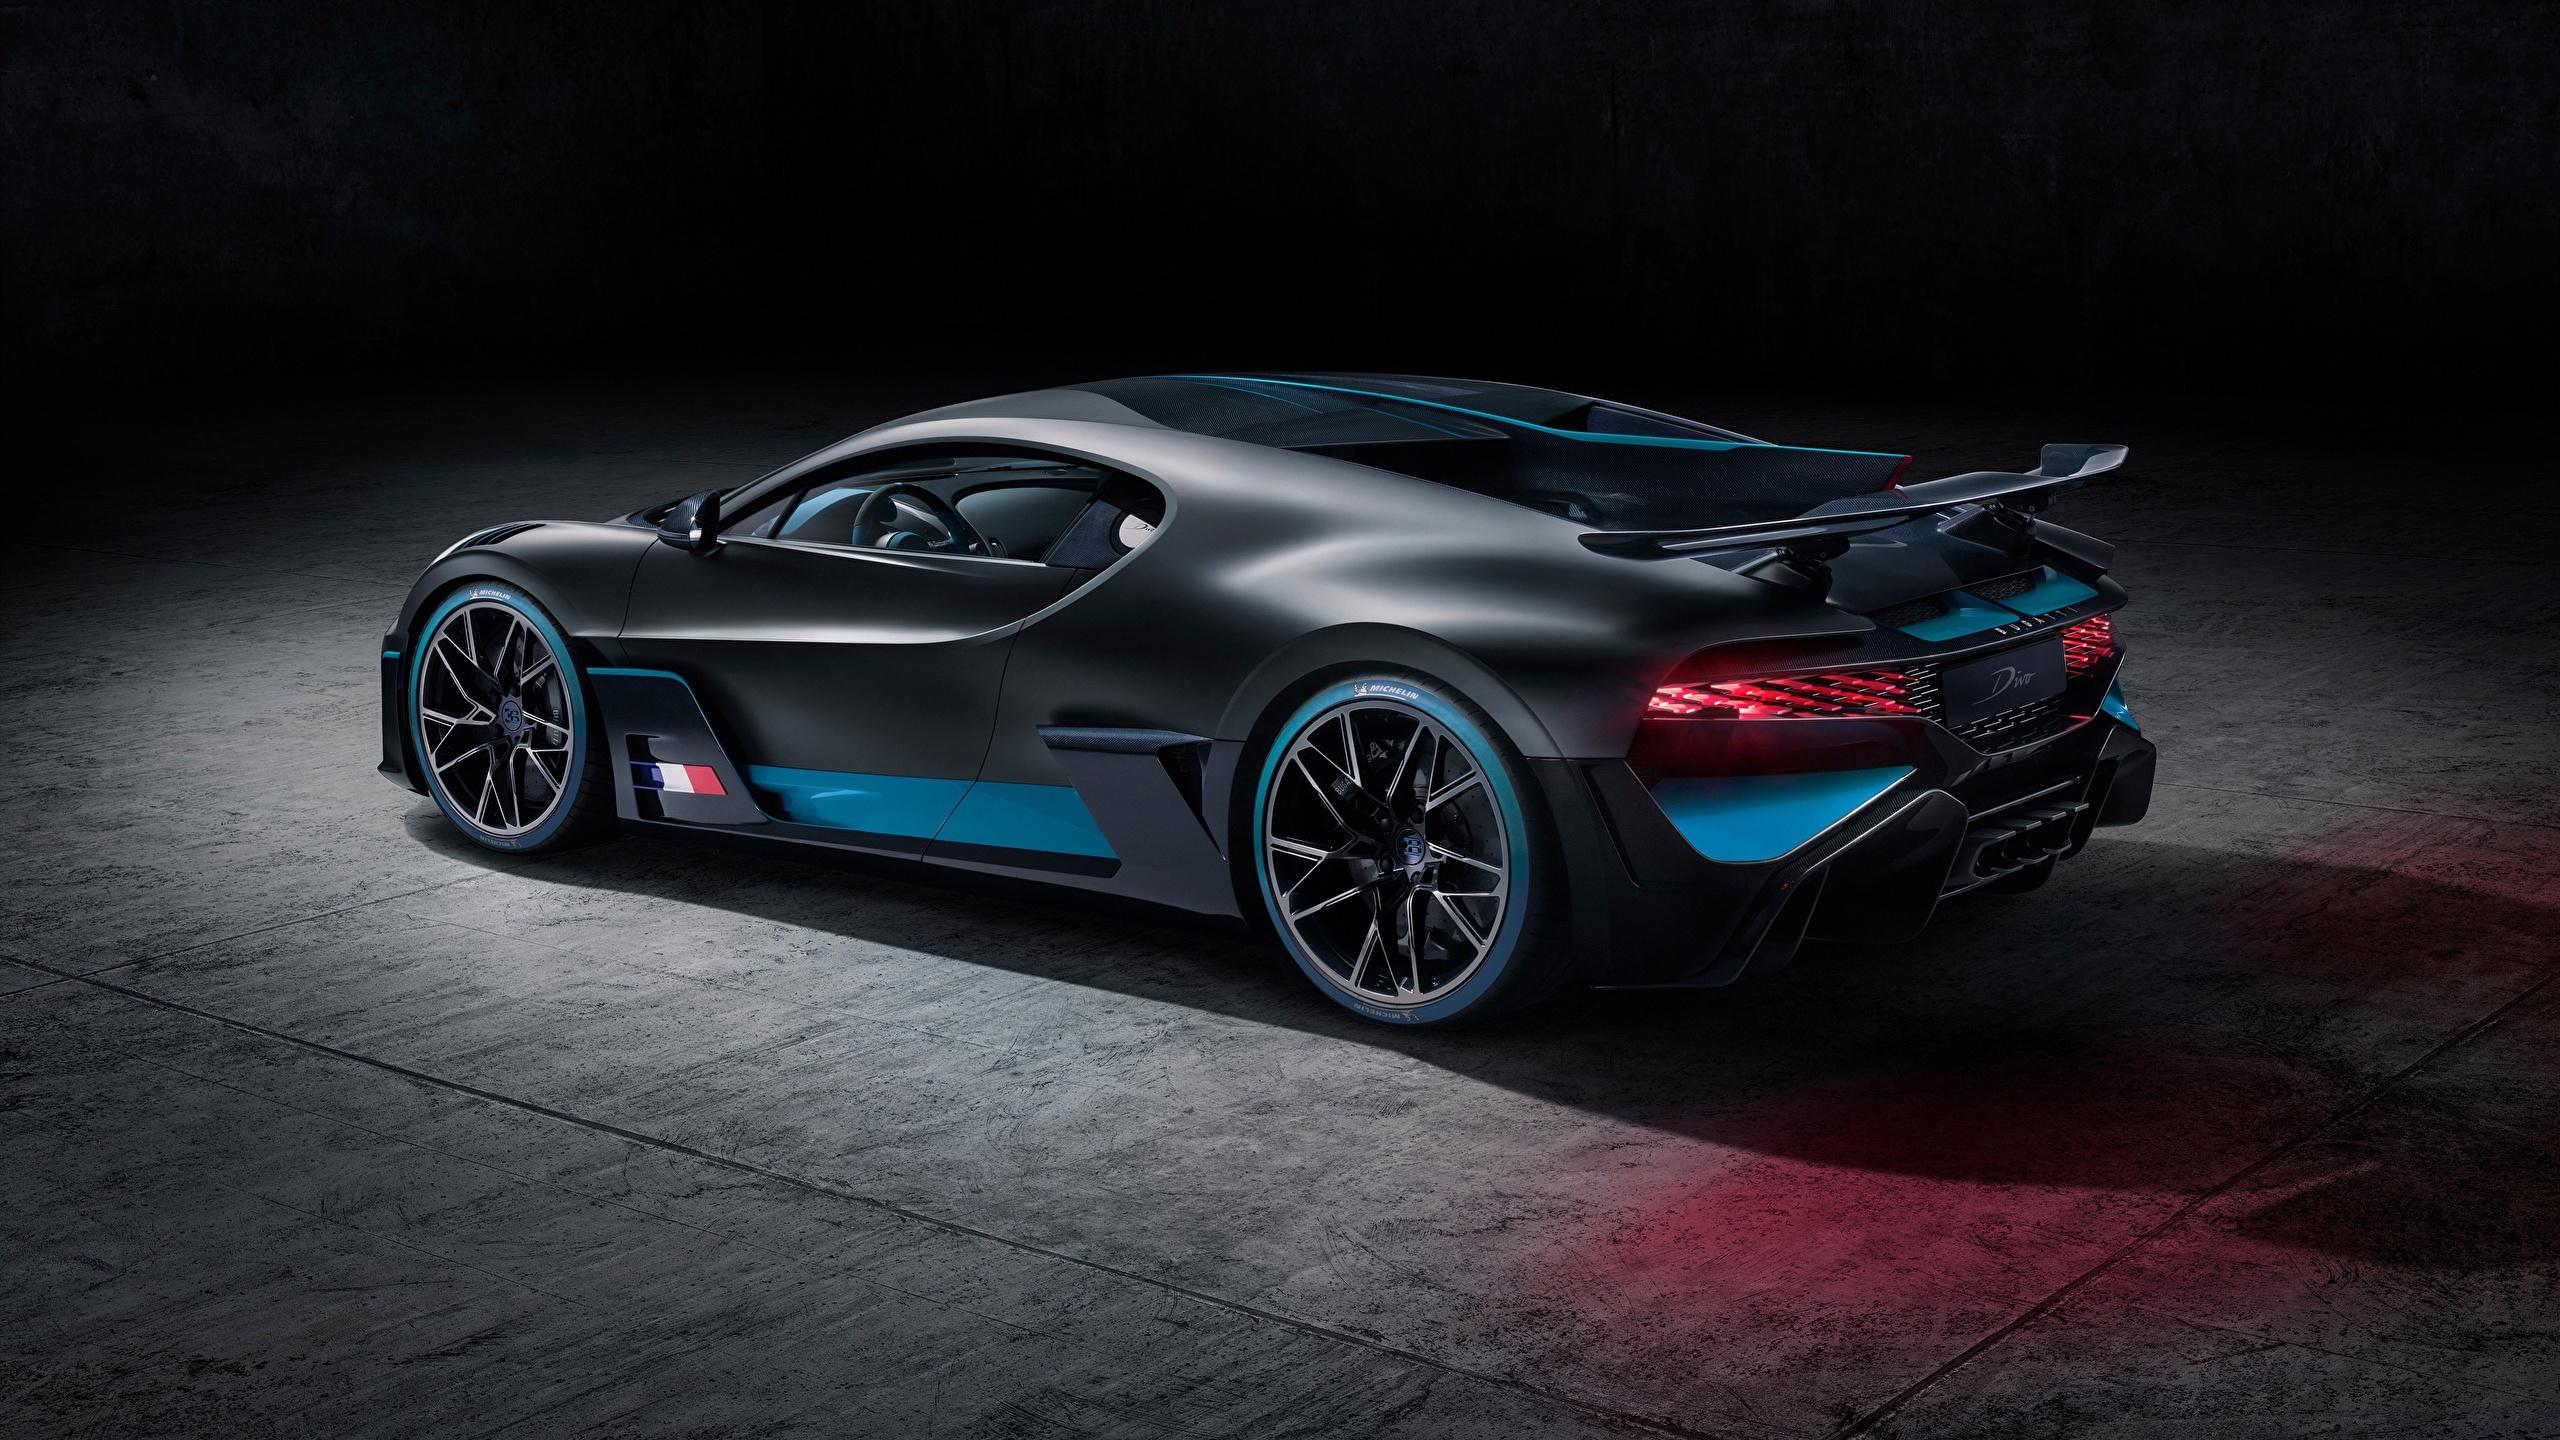 Fonds Decran 2560x1440 Bugatti Divo 2019 Noir Voitures